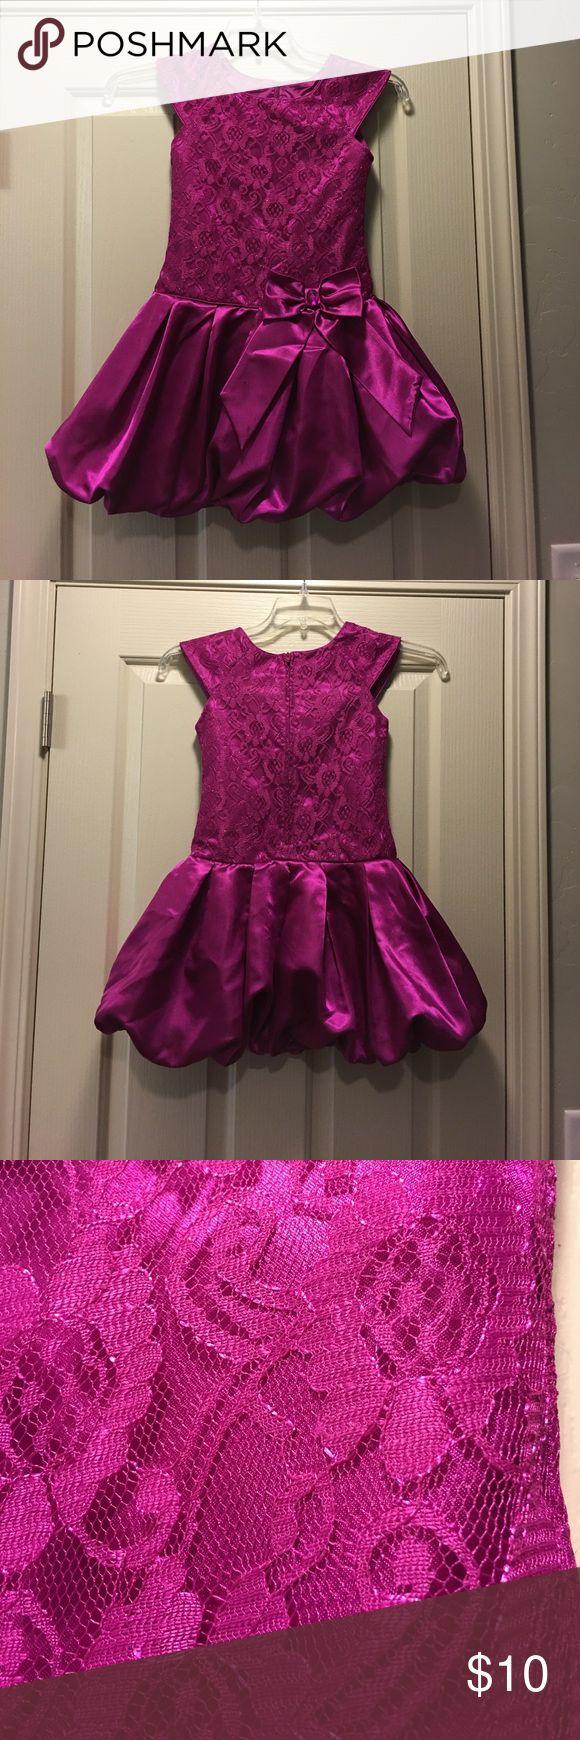 Little girl size 7 fancy hot pink dress Only worn a few times. It is in perfect shape! Size 7 in little girls. A hot pink color, maybe a bit maroon. Jona Michelle Dresses Formal